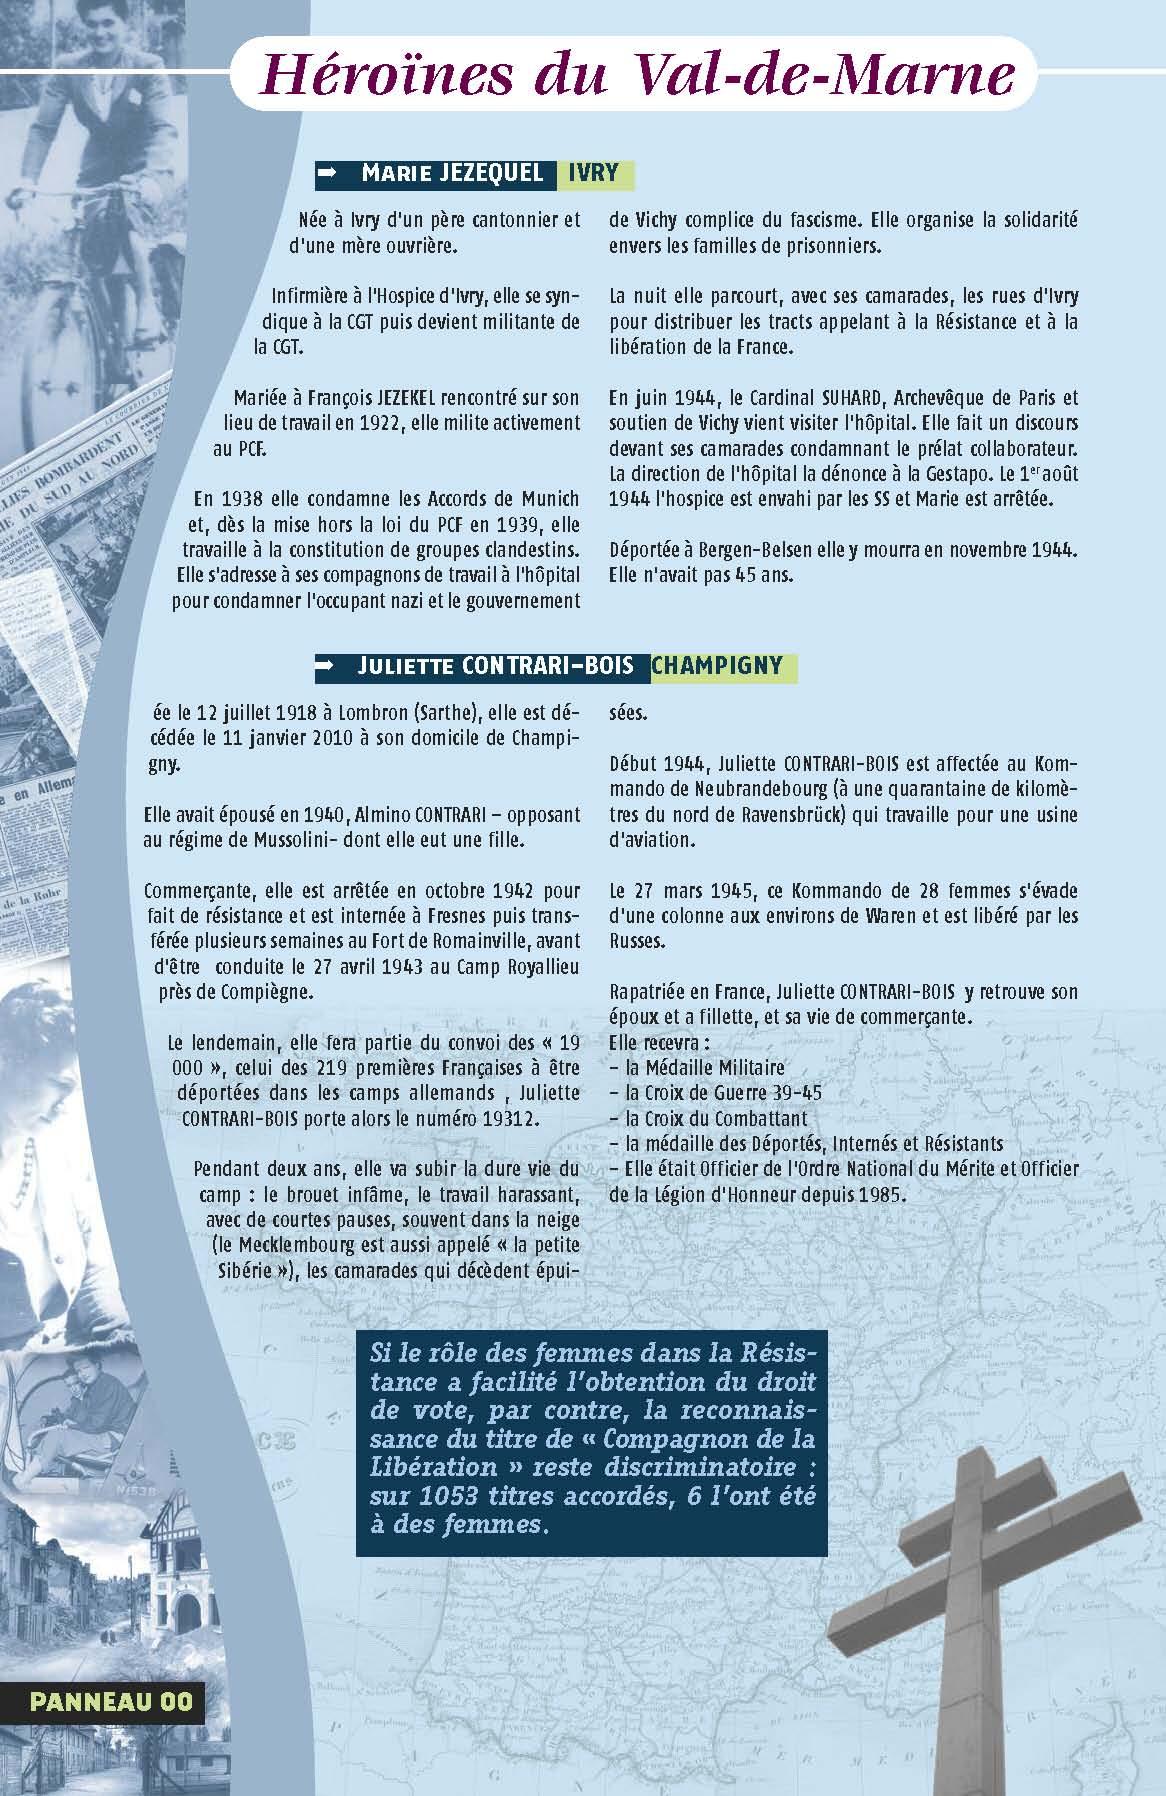 Pano8 11 page 2